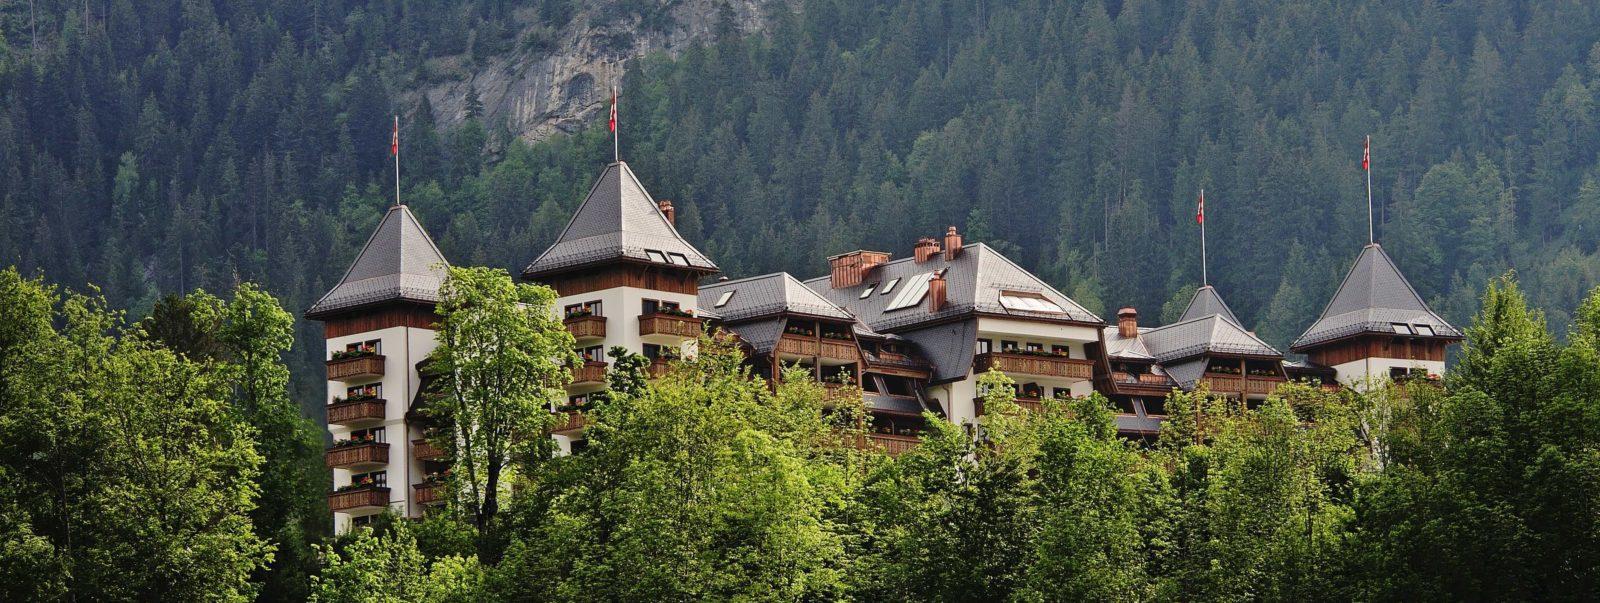 Hôtel Alpina Gstaad